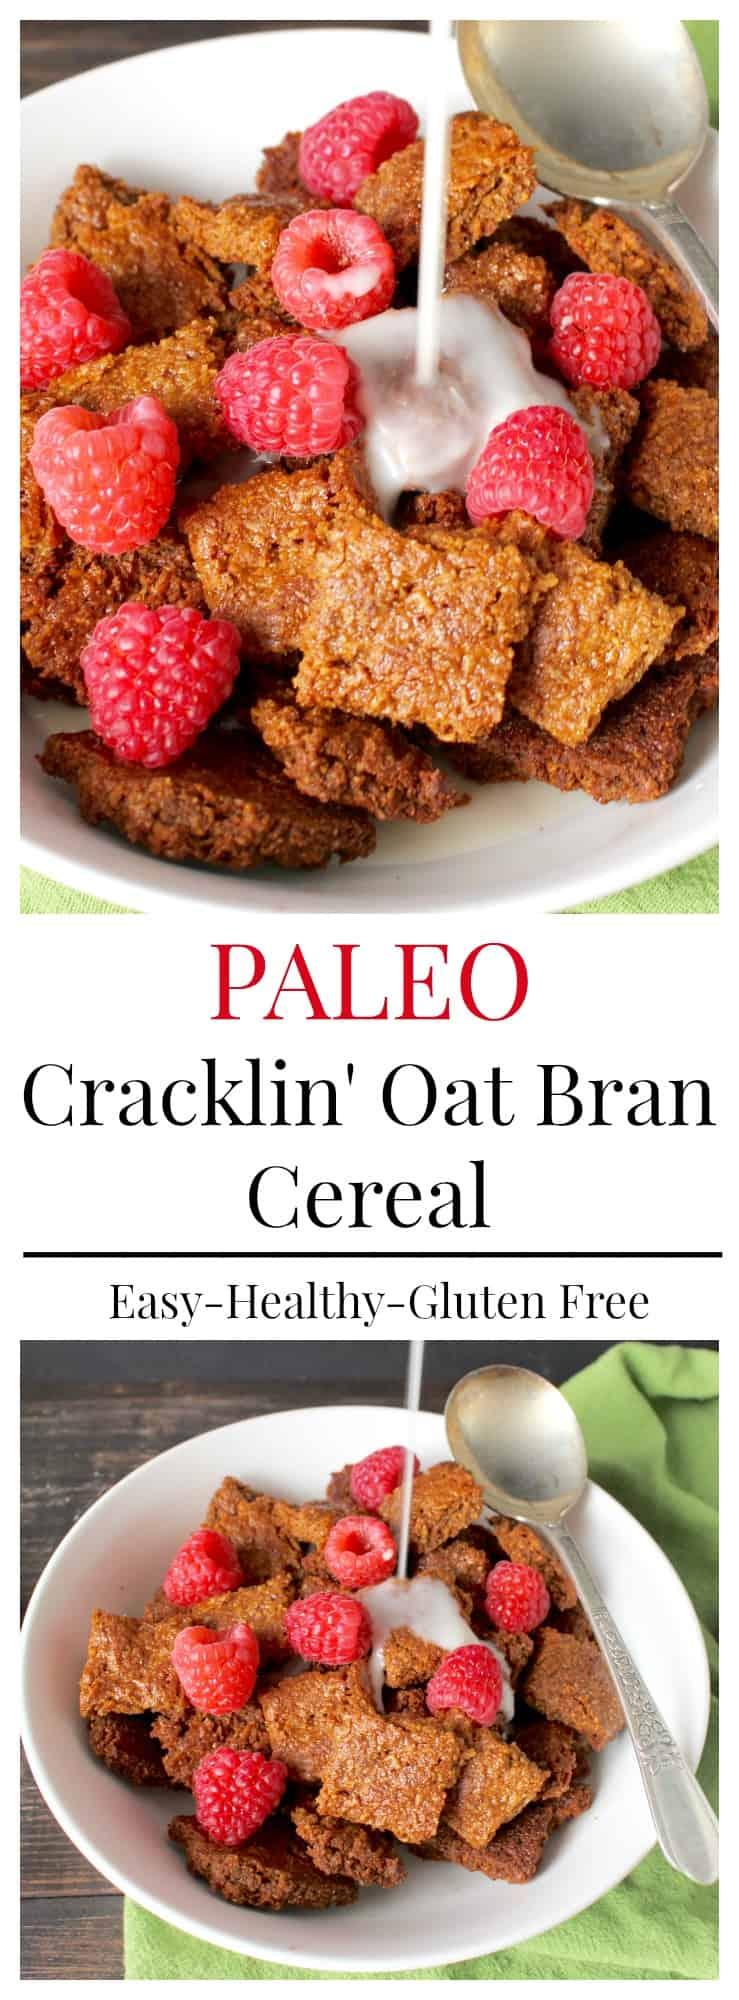 Paleo Cracklin Oat Bran